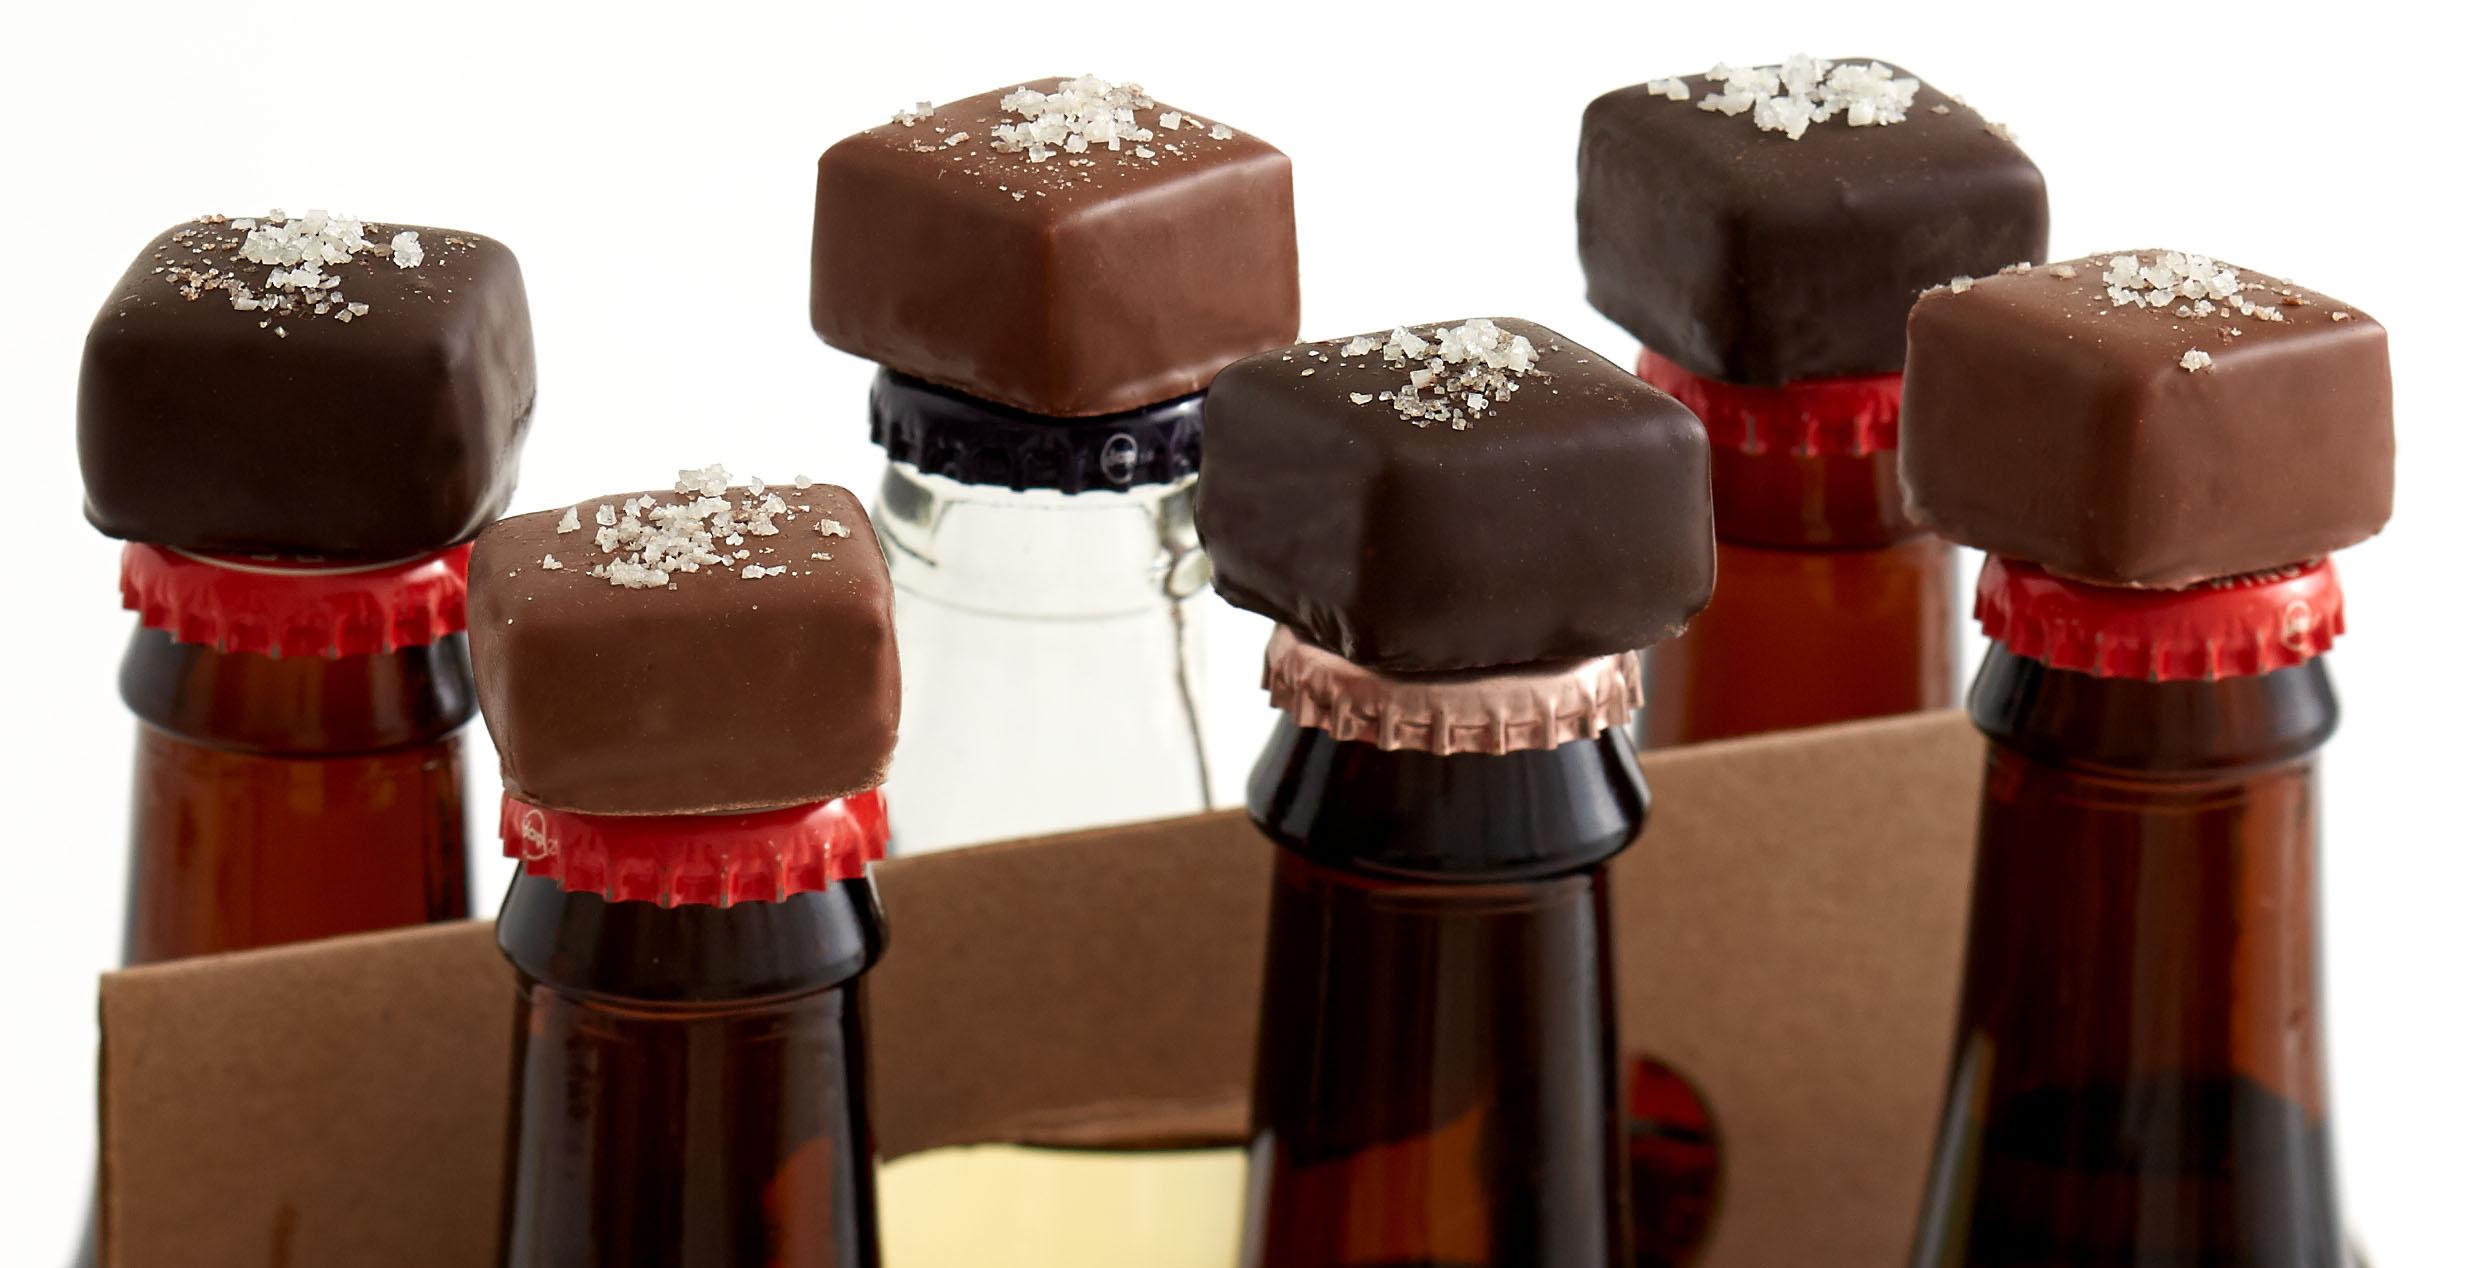 Pair Beer Amp Chocolate For Oktoberfest Shari S Berries Blog